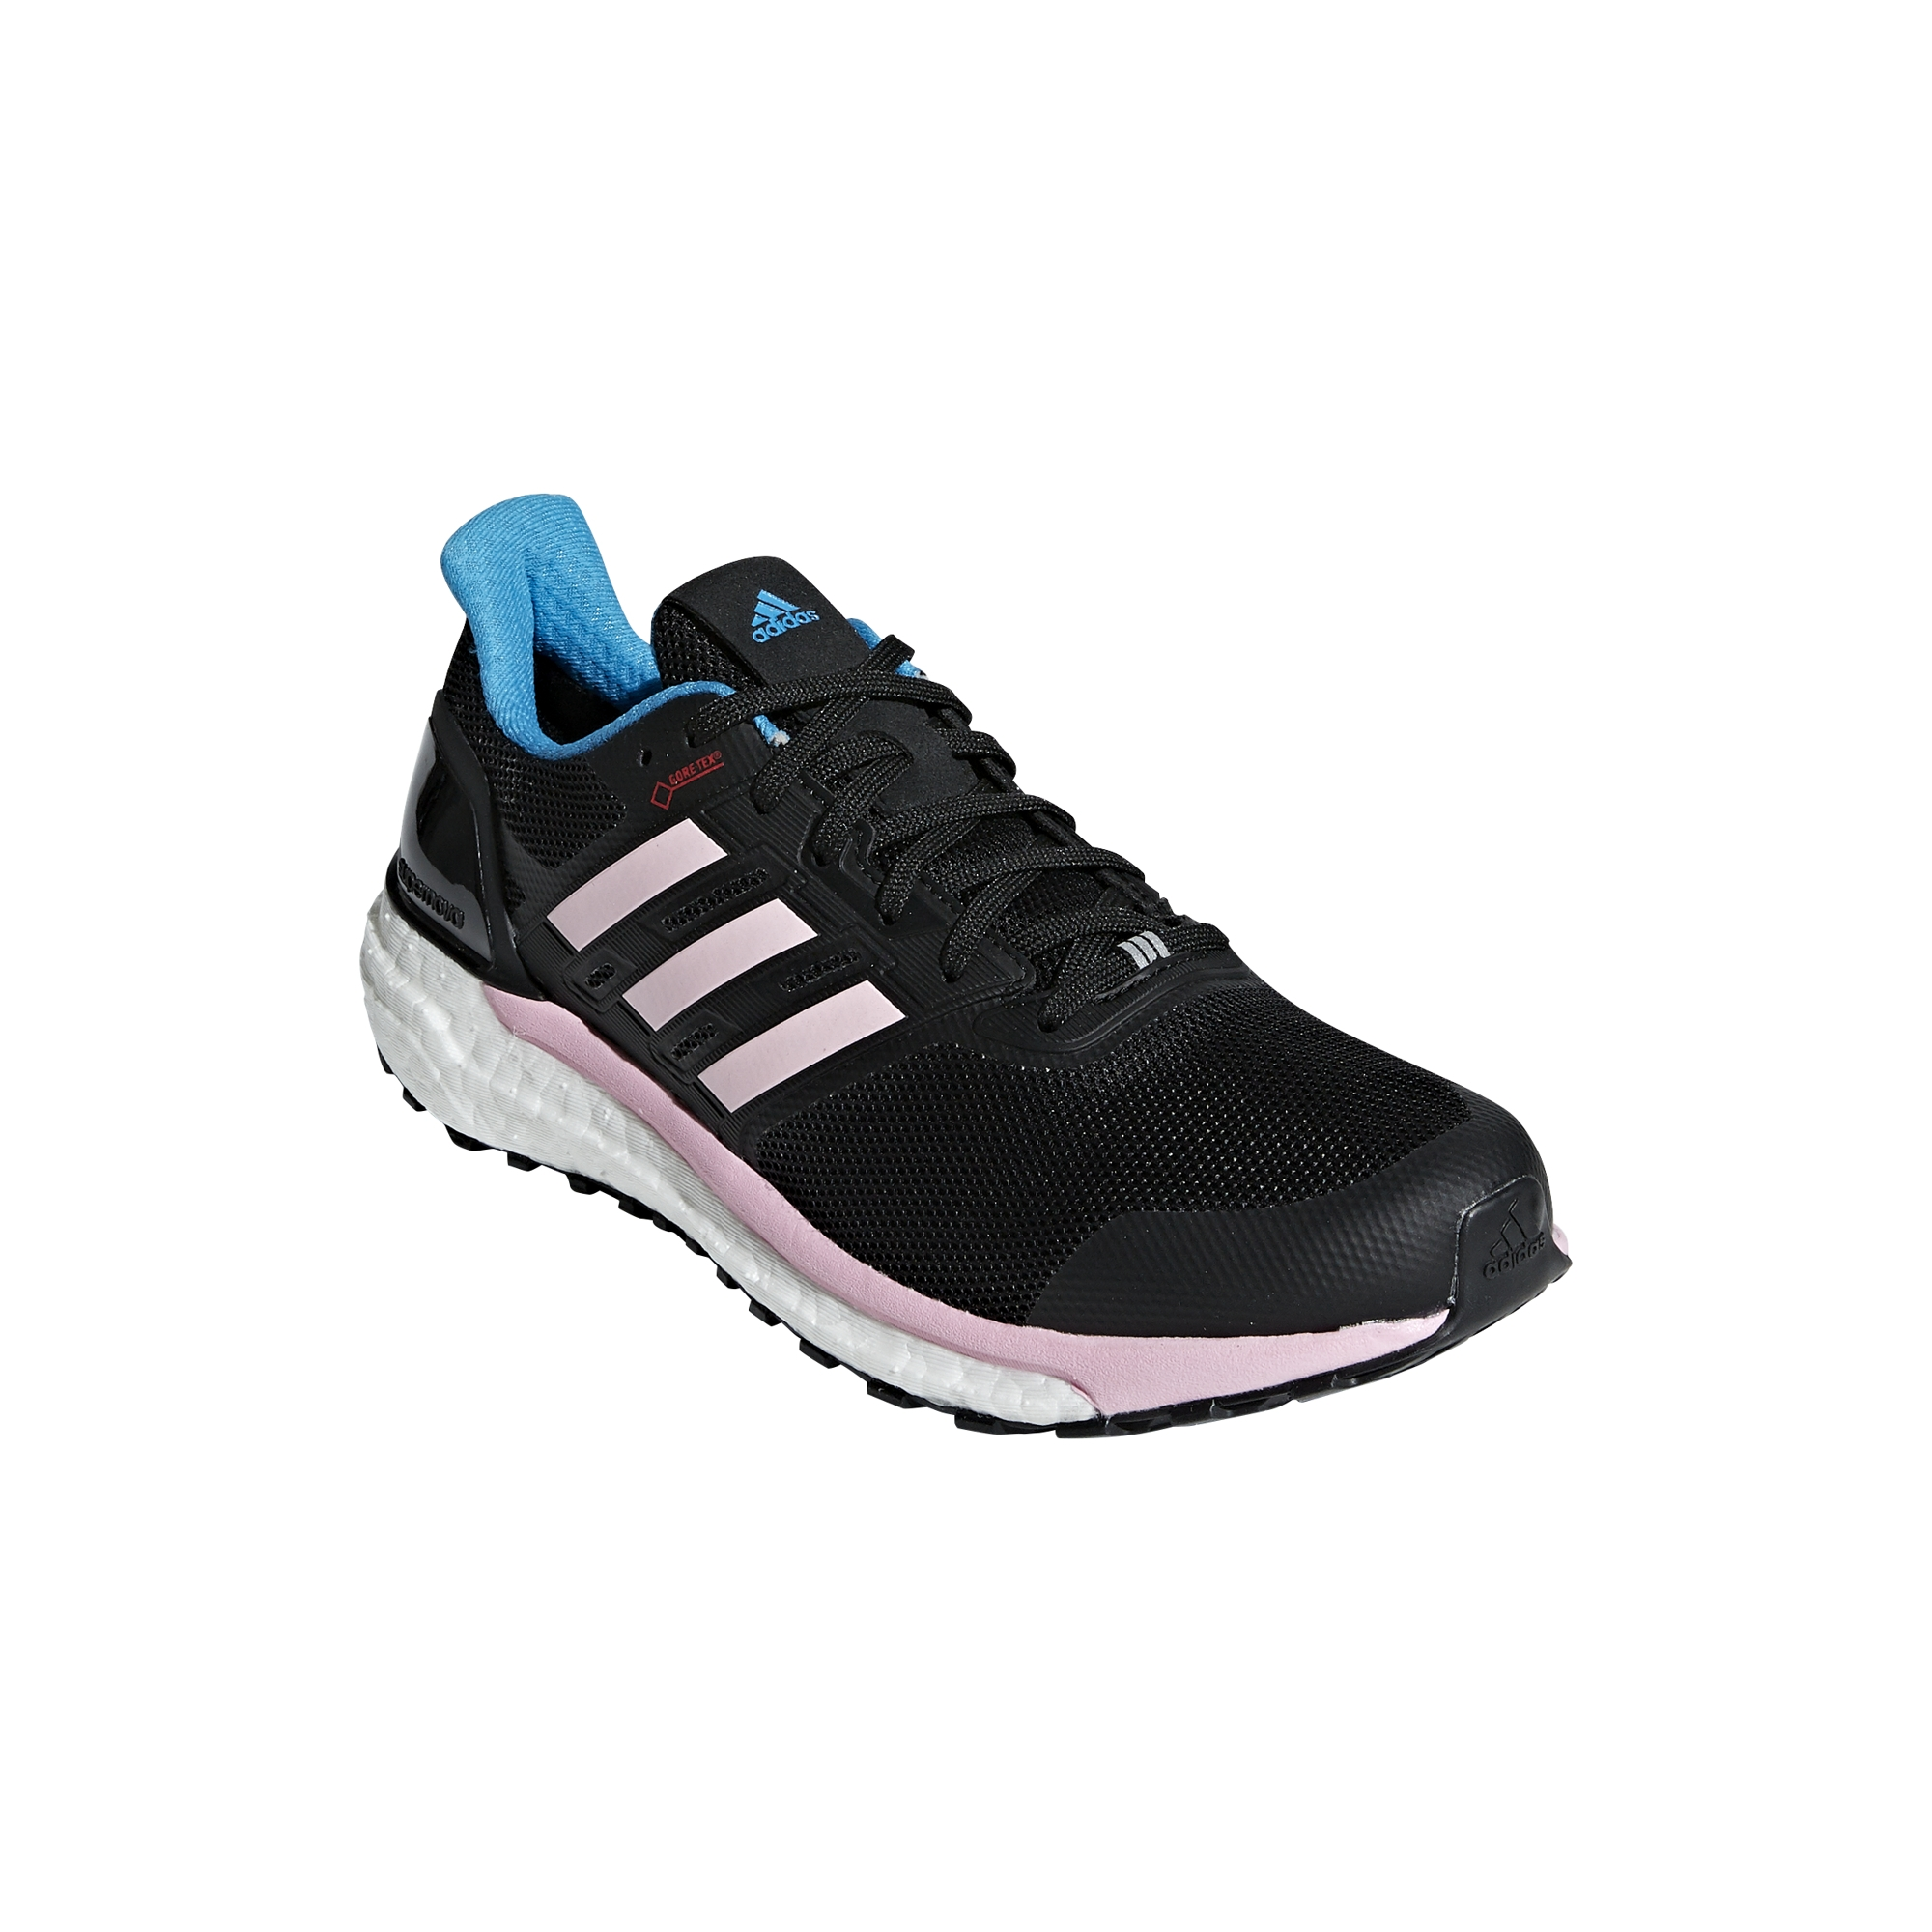 Chaussures femme adidas Supernova Gore Tex